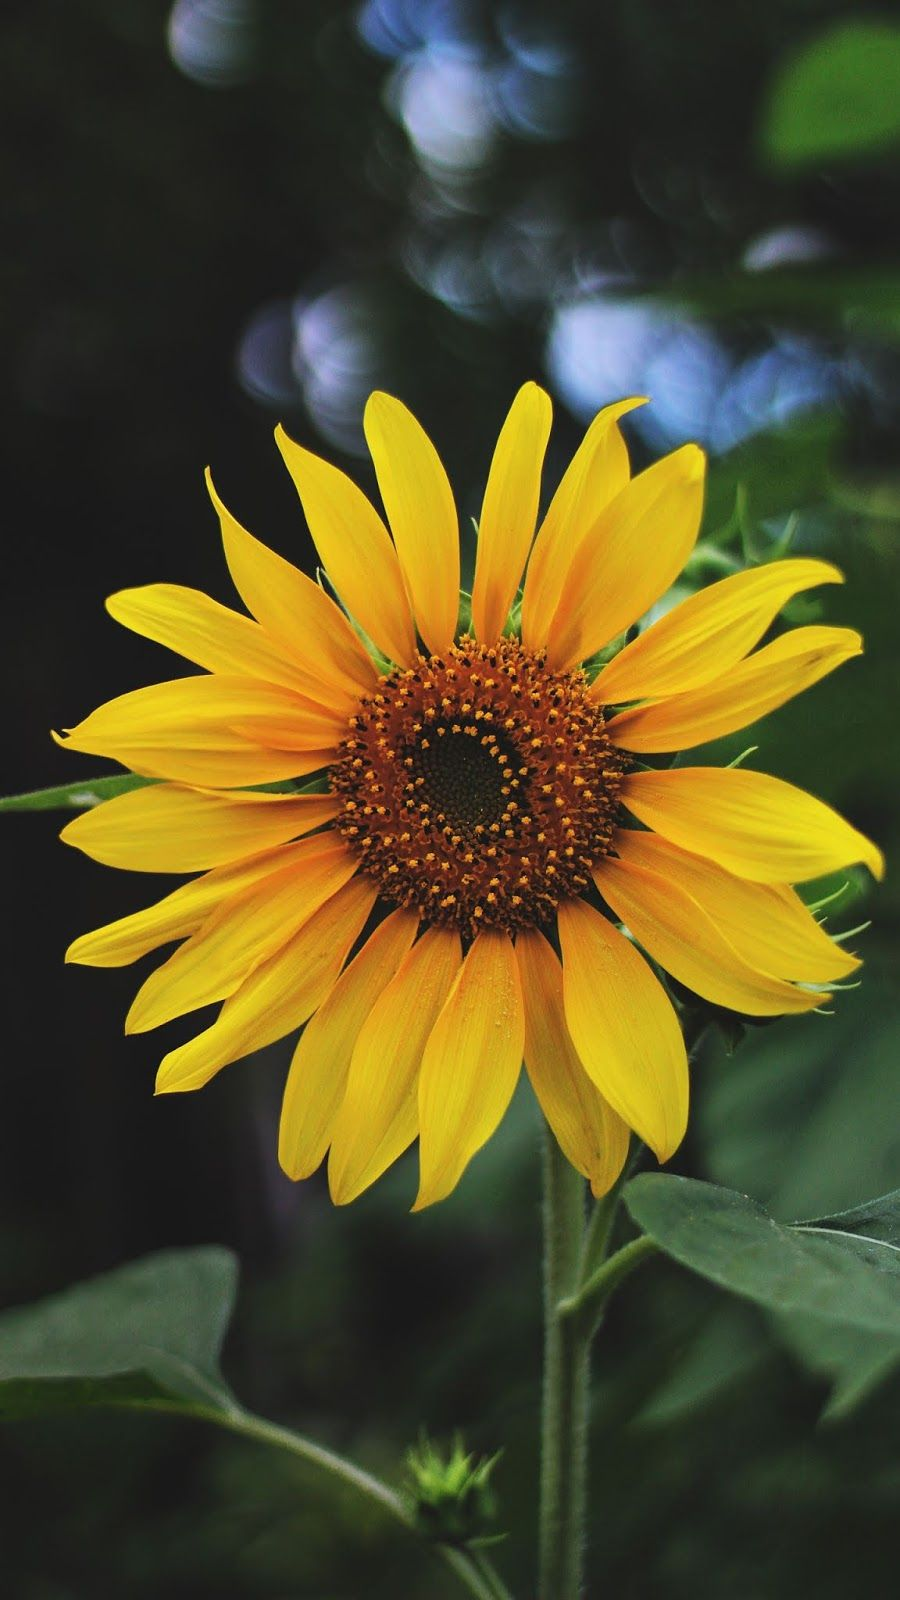 The Sunflower Wallpaper Iphone Android Background Followme Sunflower Iphone Wallpaper Sunflower Wallpaper Dandelion Wallpaper